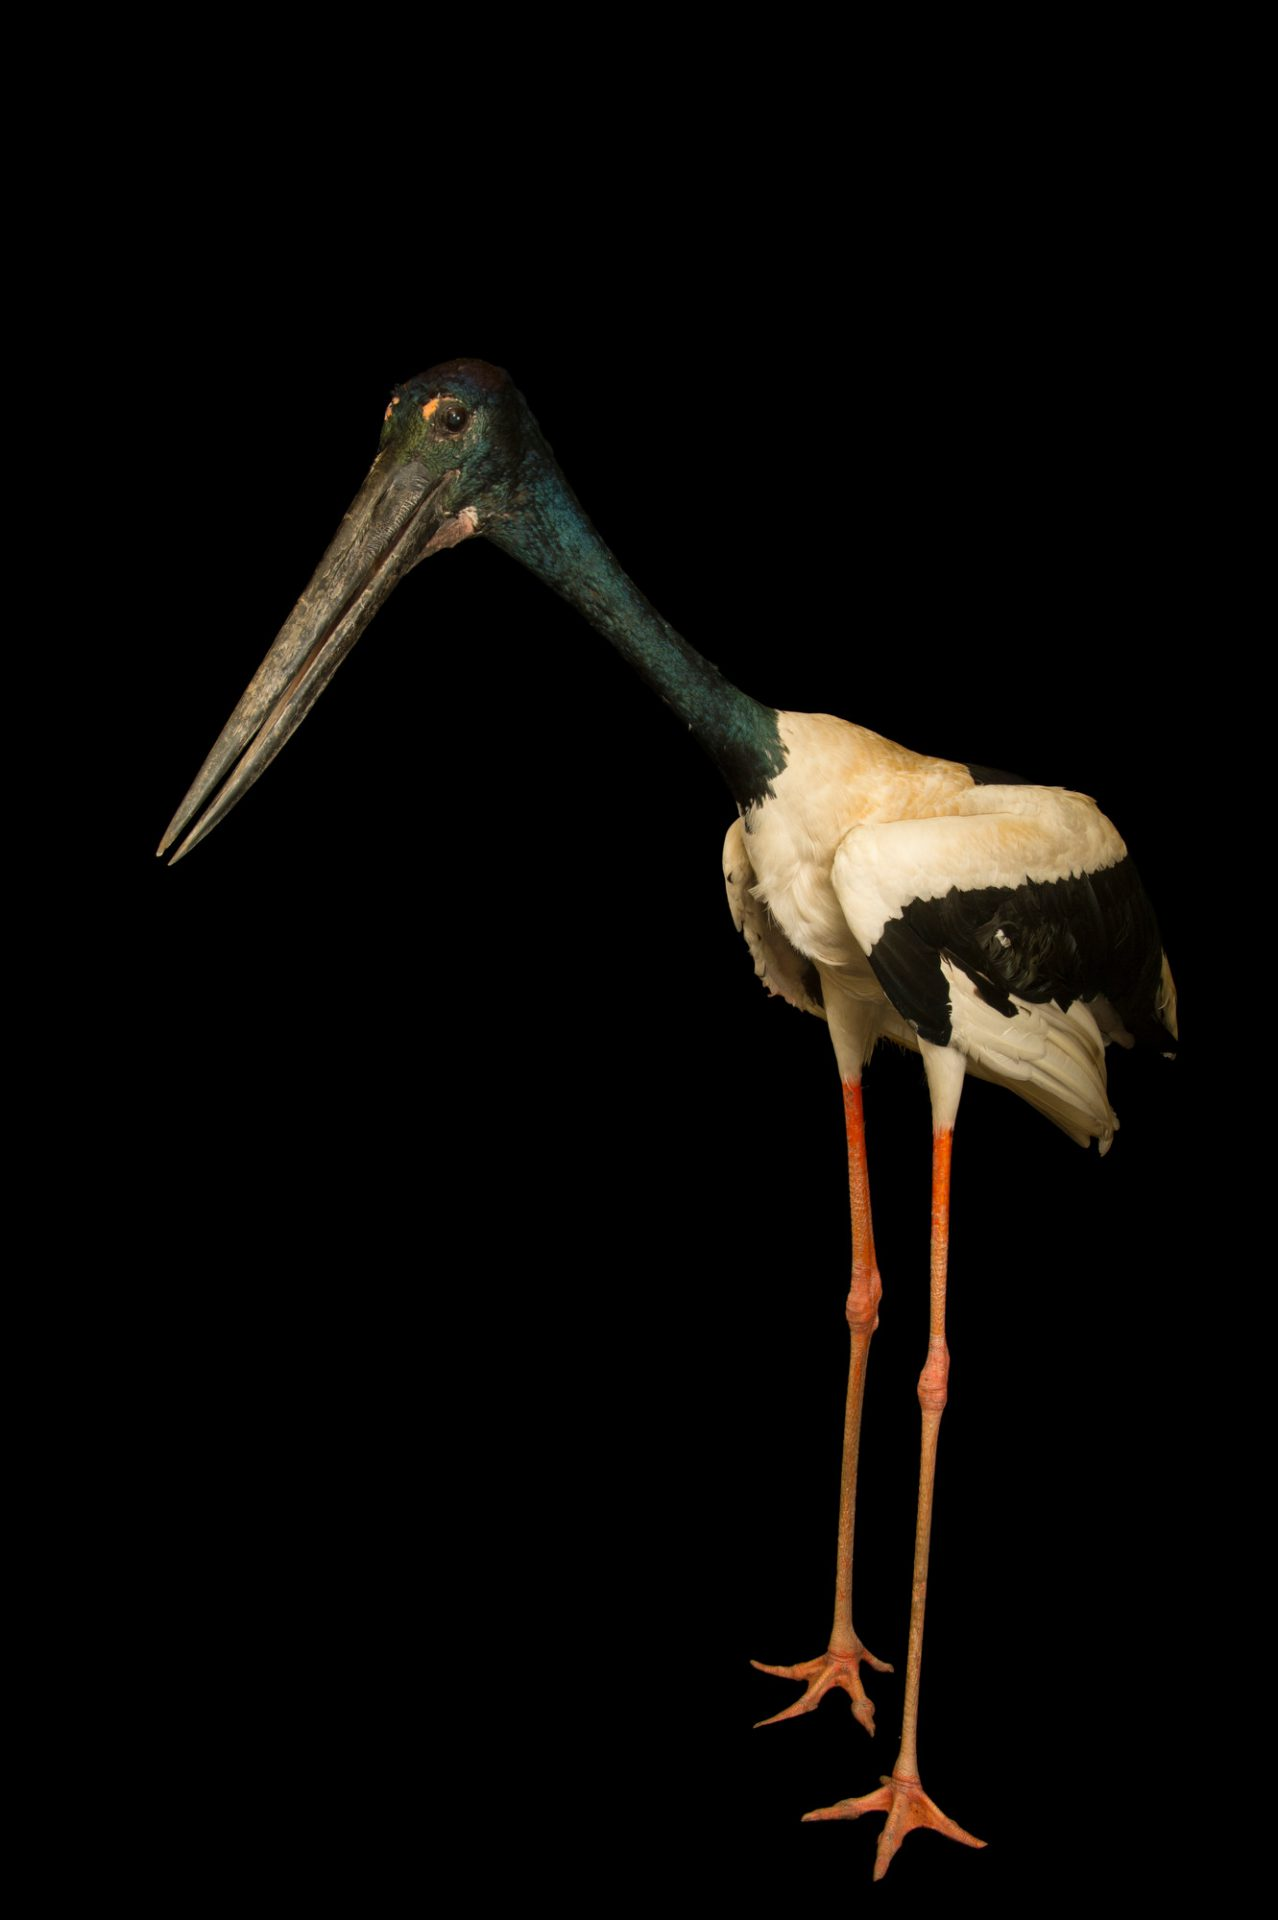 Black-necked stork (Ephippiorhynchus asiaticus) at Kamla Nehru Zoological Garden, Ahmedabad, India.